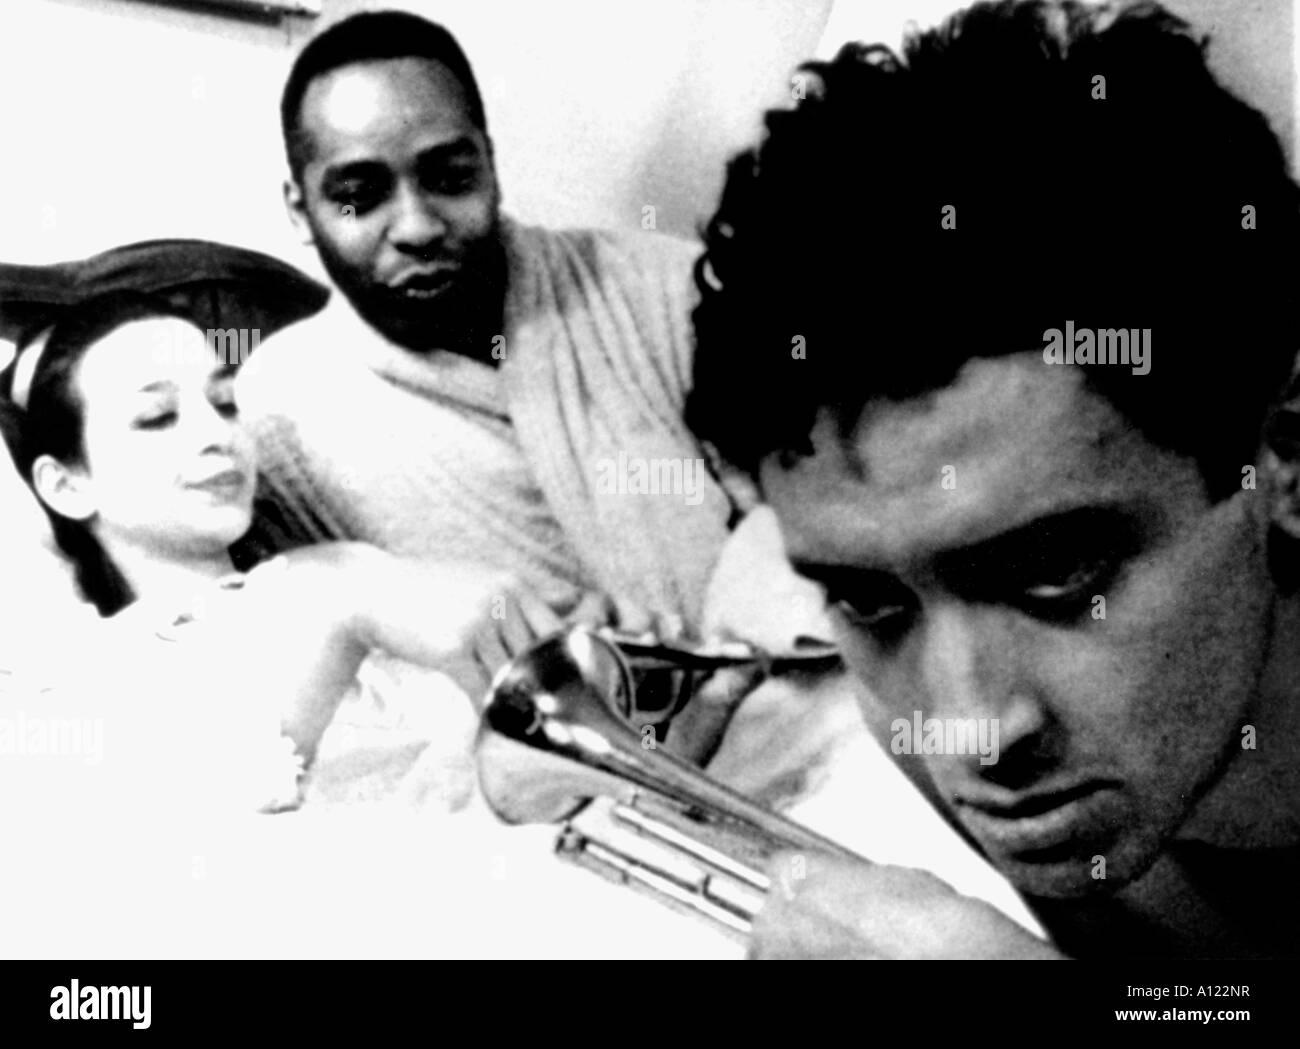 Tinashe,Pauline Mendoza (b. 1999) Erotic video Inga Savits EST 1 2002,Jillian Reynolds (naturalized American citizen)